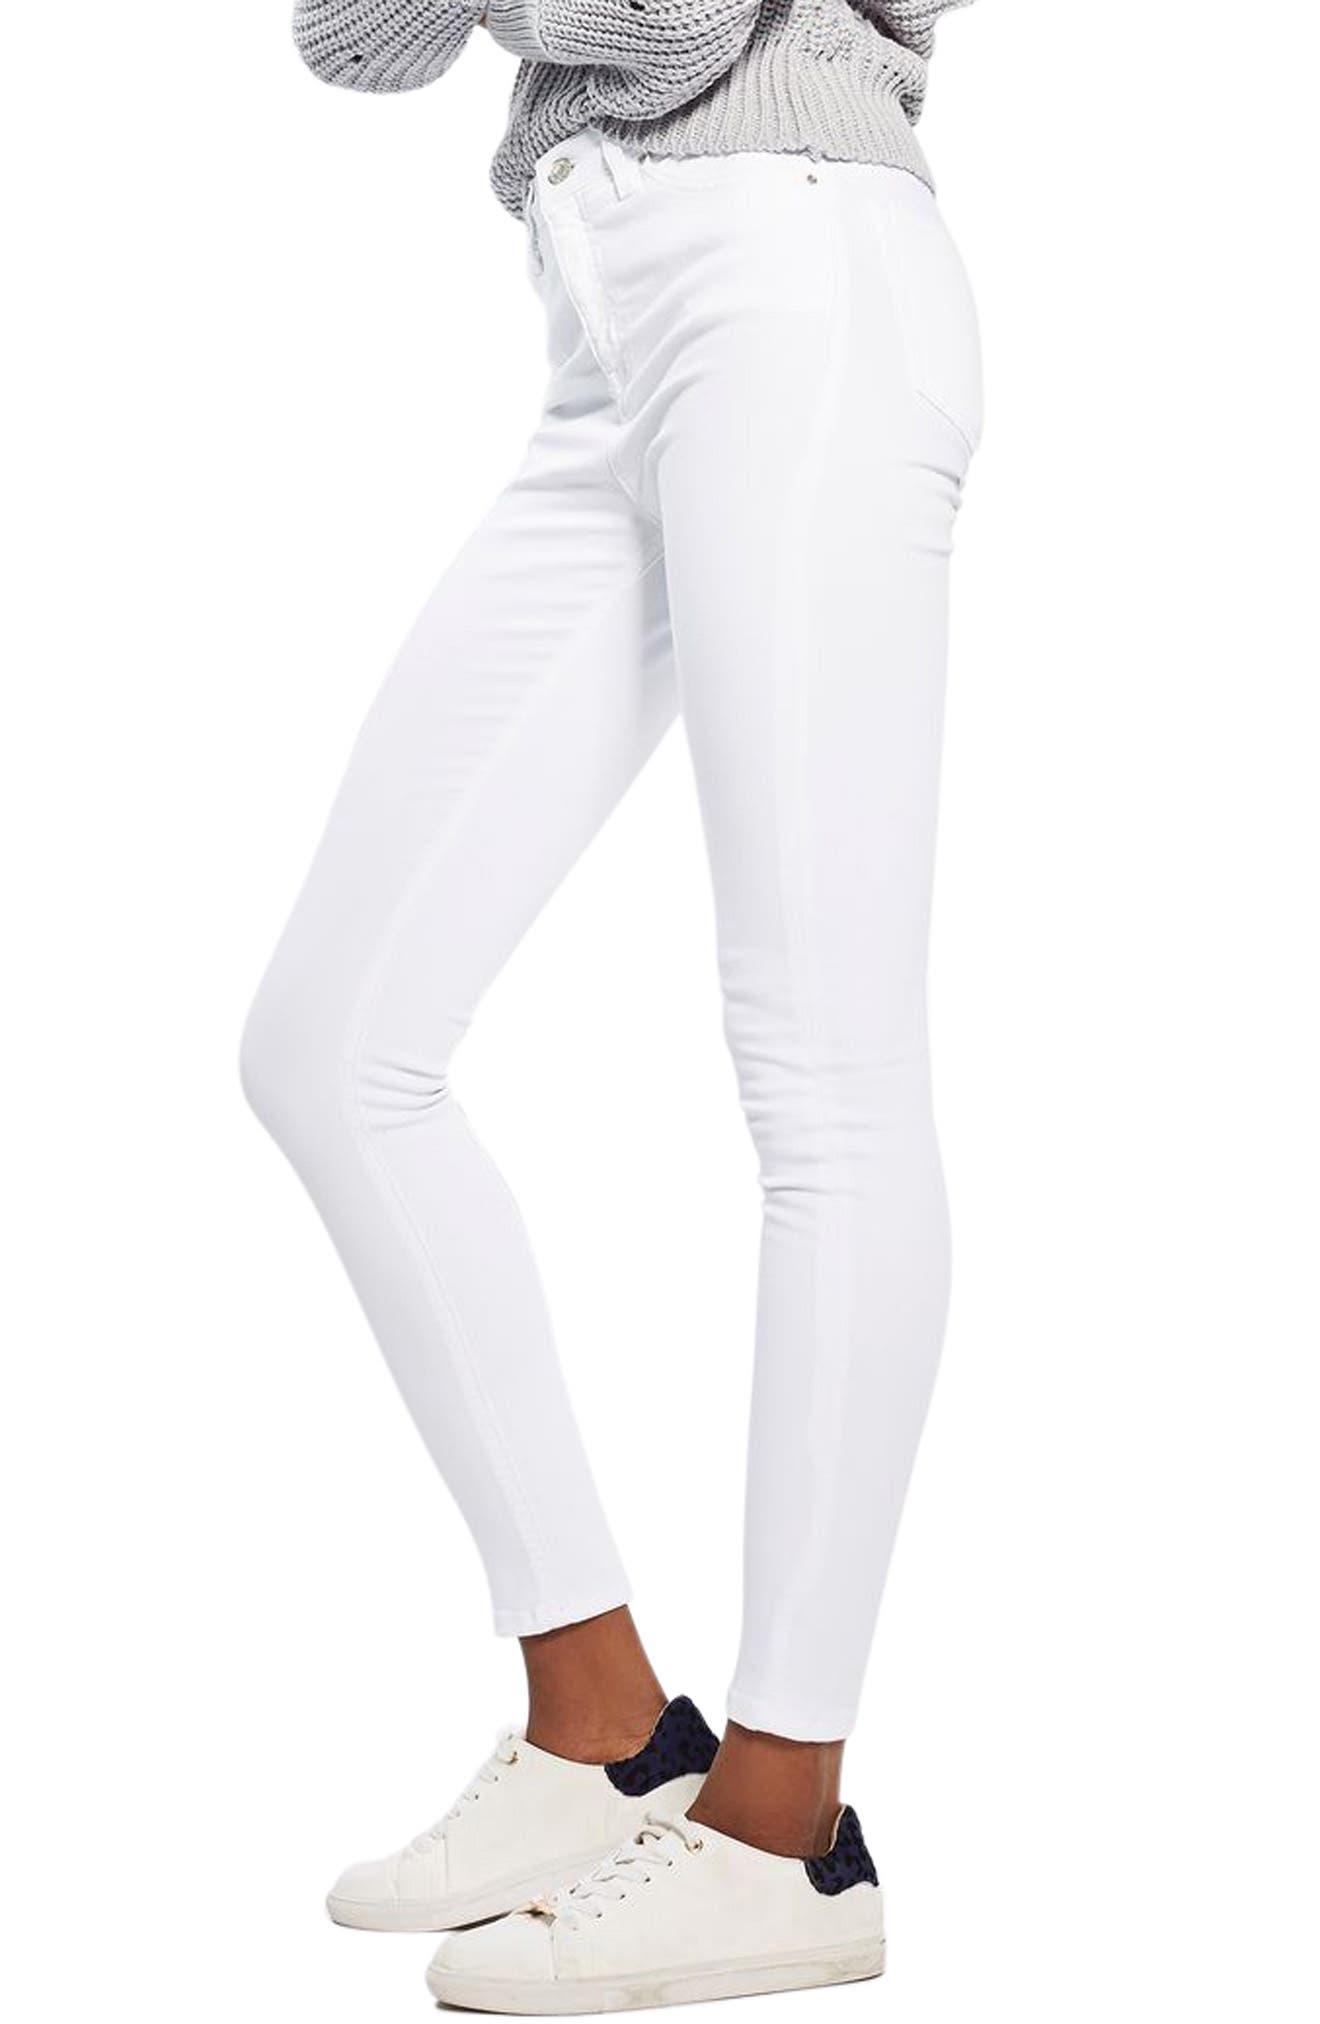 Topshop Jamie High Waist Ankle Skinny Jeans (Regular & Petite)